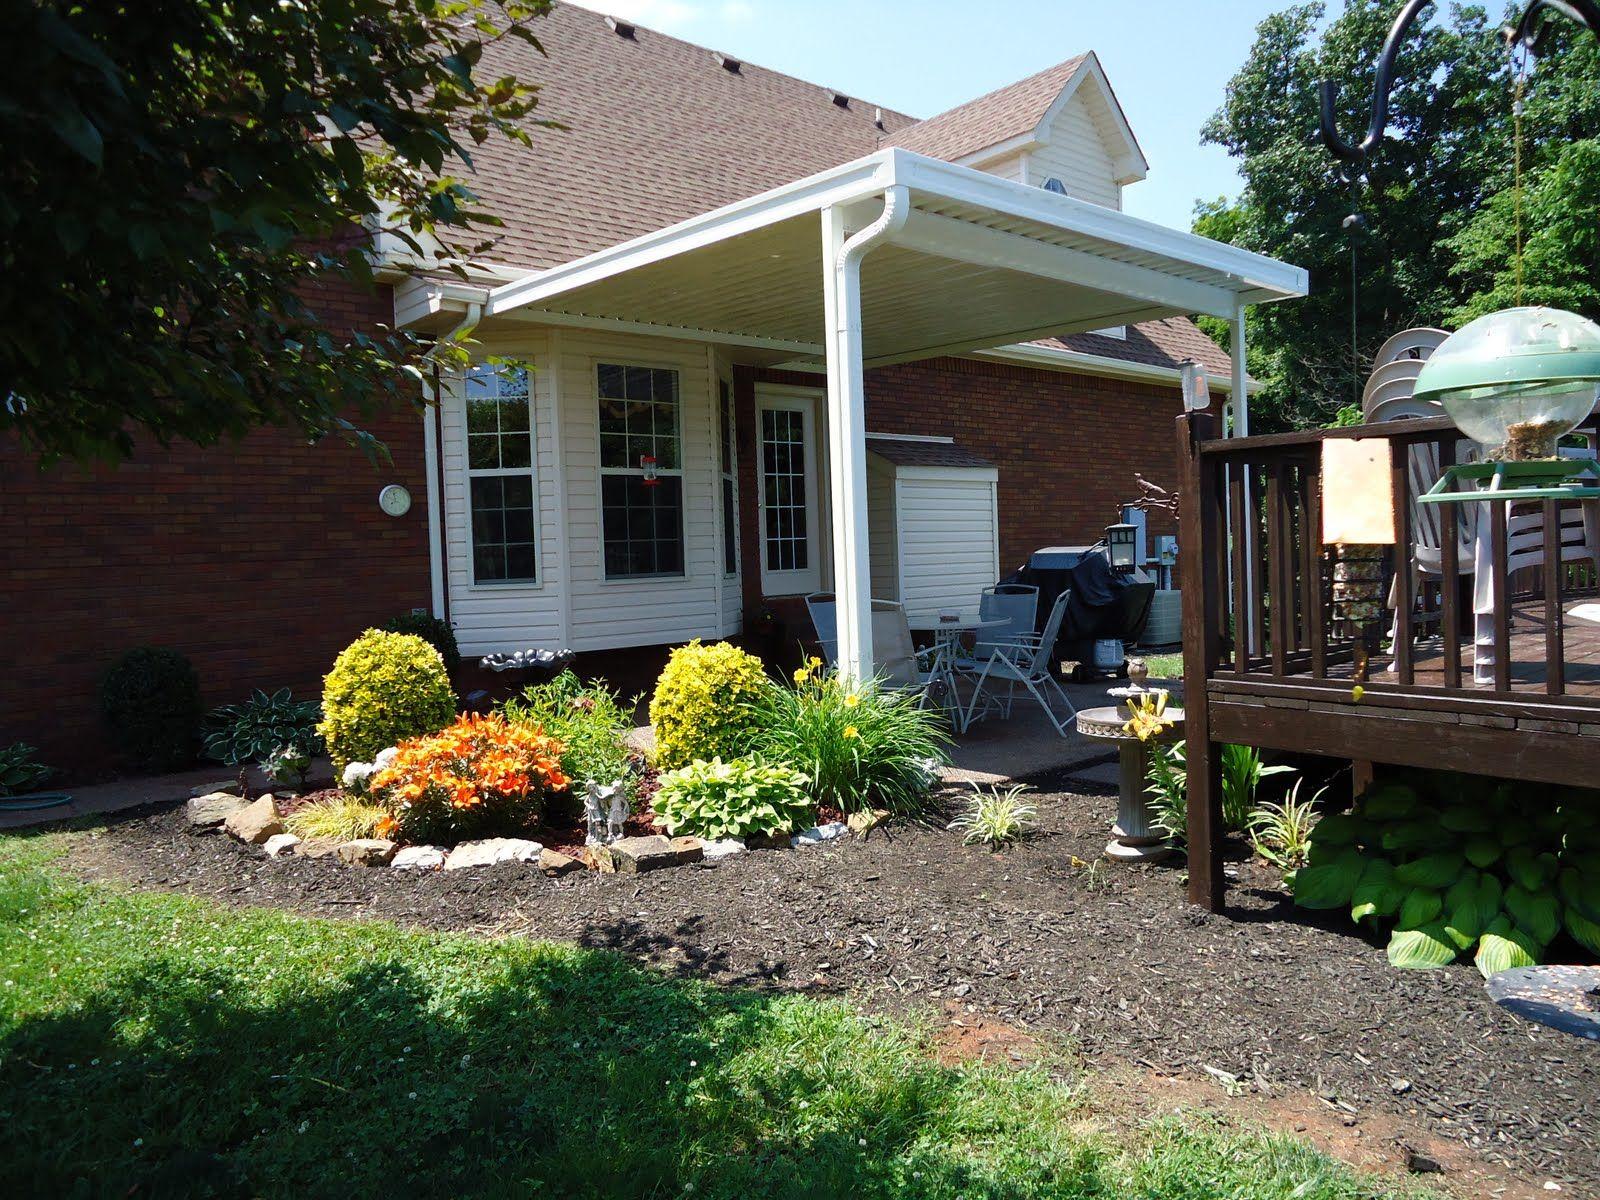 Inexpensive Patio Ideas   Cheap+patio+covers+ideas ... on Cheap Patio Enclosure Ideas  id=92939